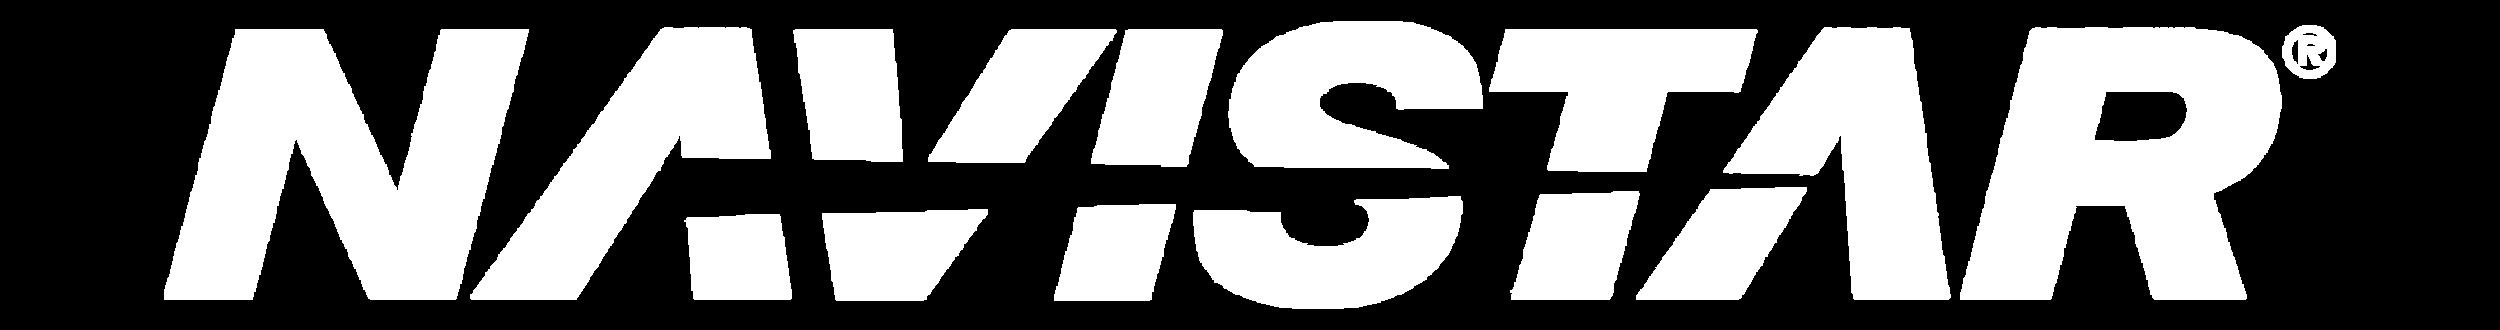 Navistar_Logo_White.png